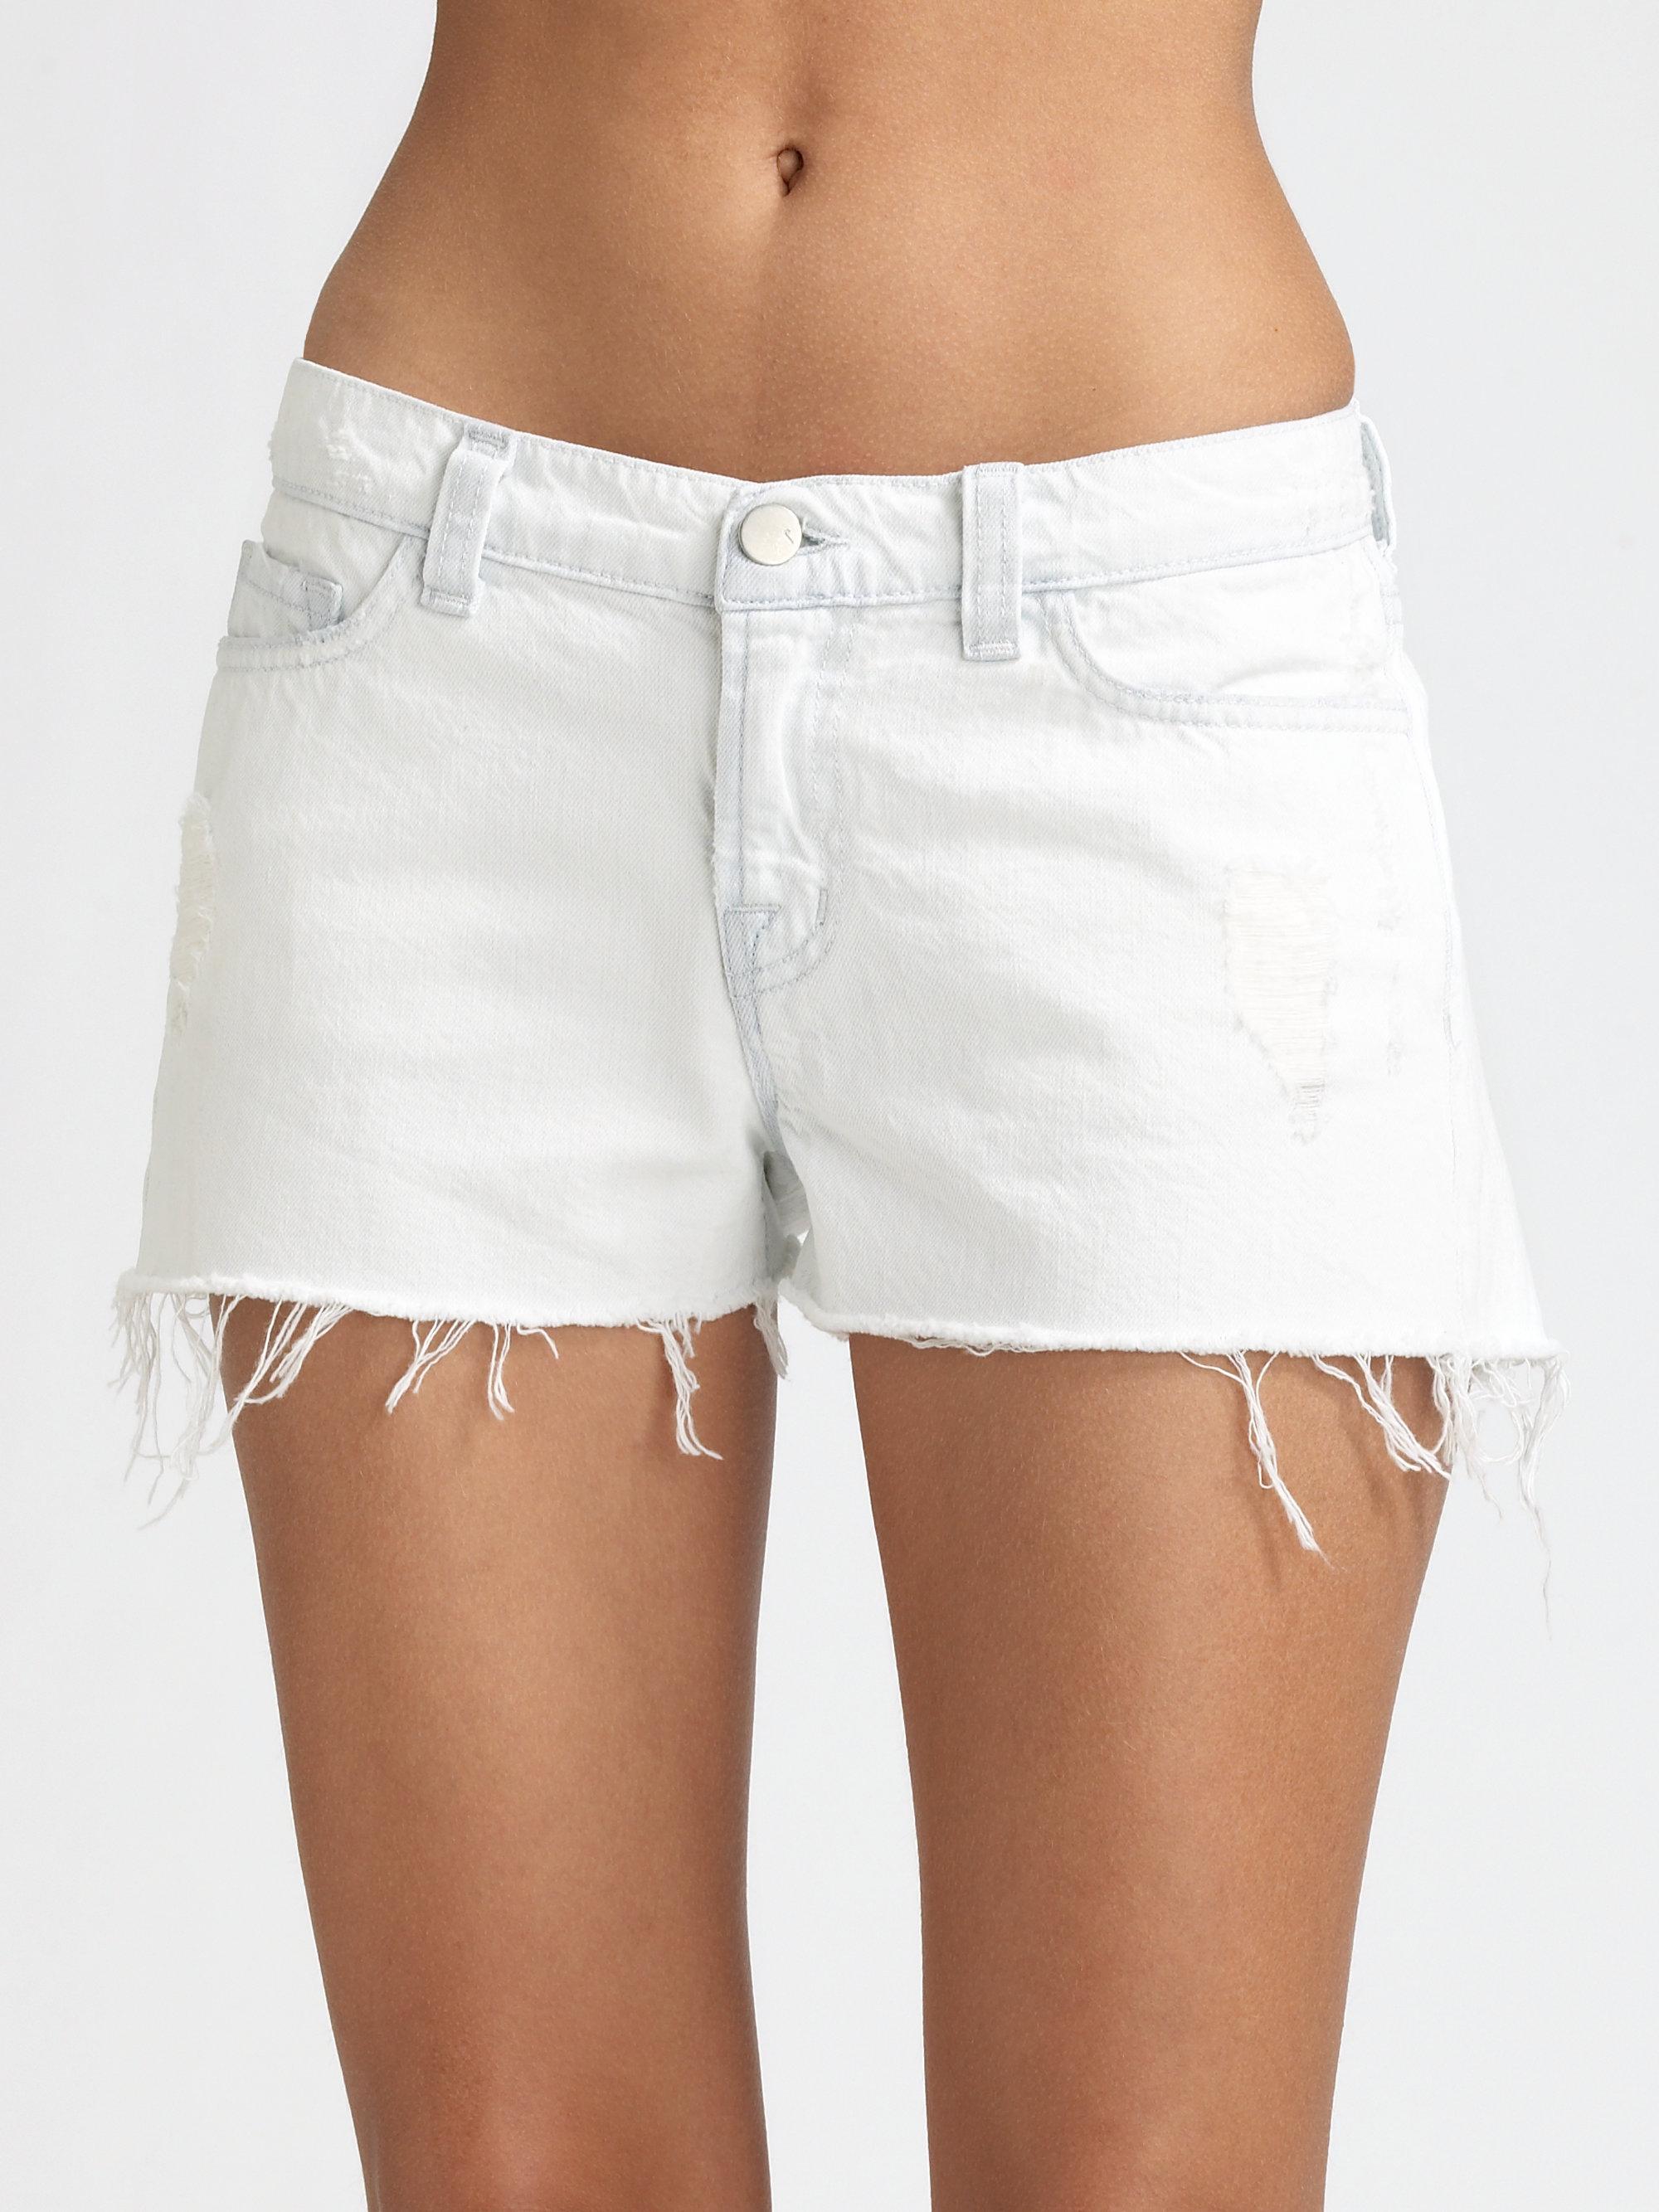 J brand Cutoff Denim Shorts in White | Lyst